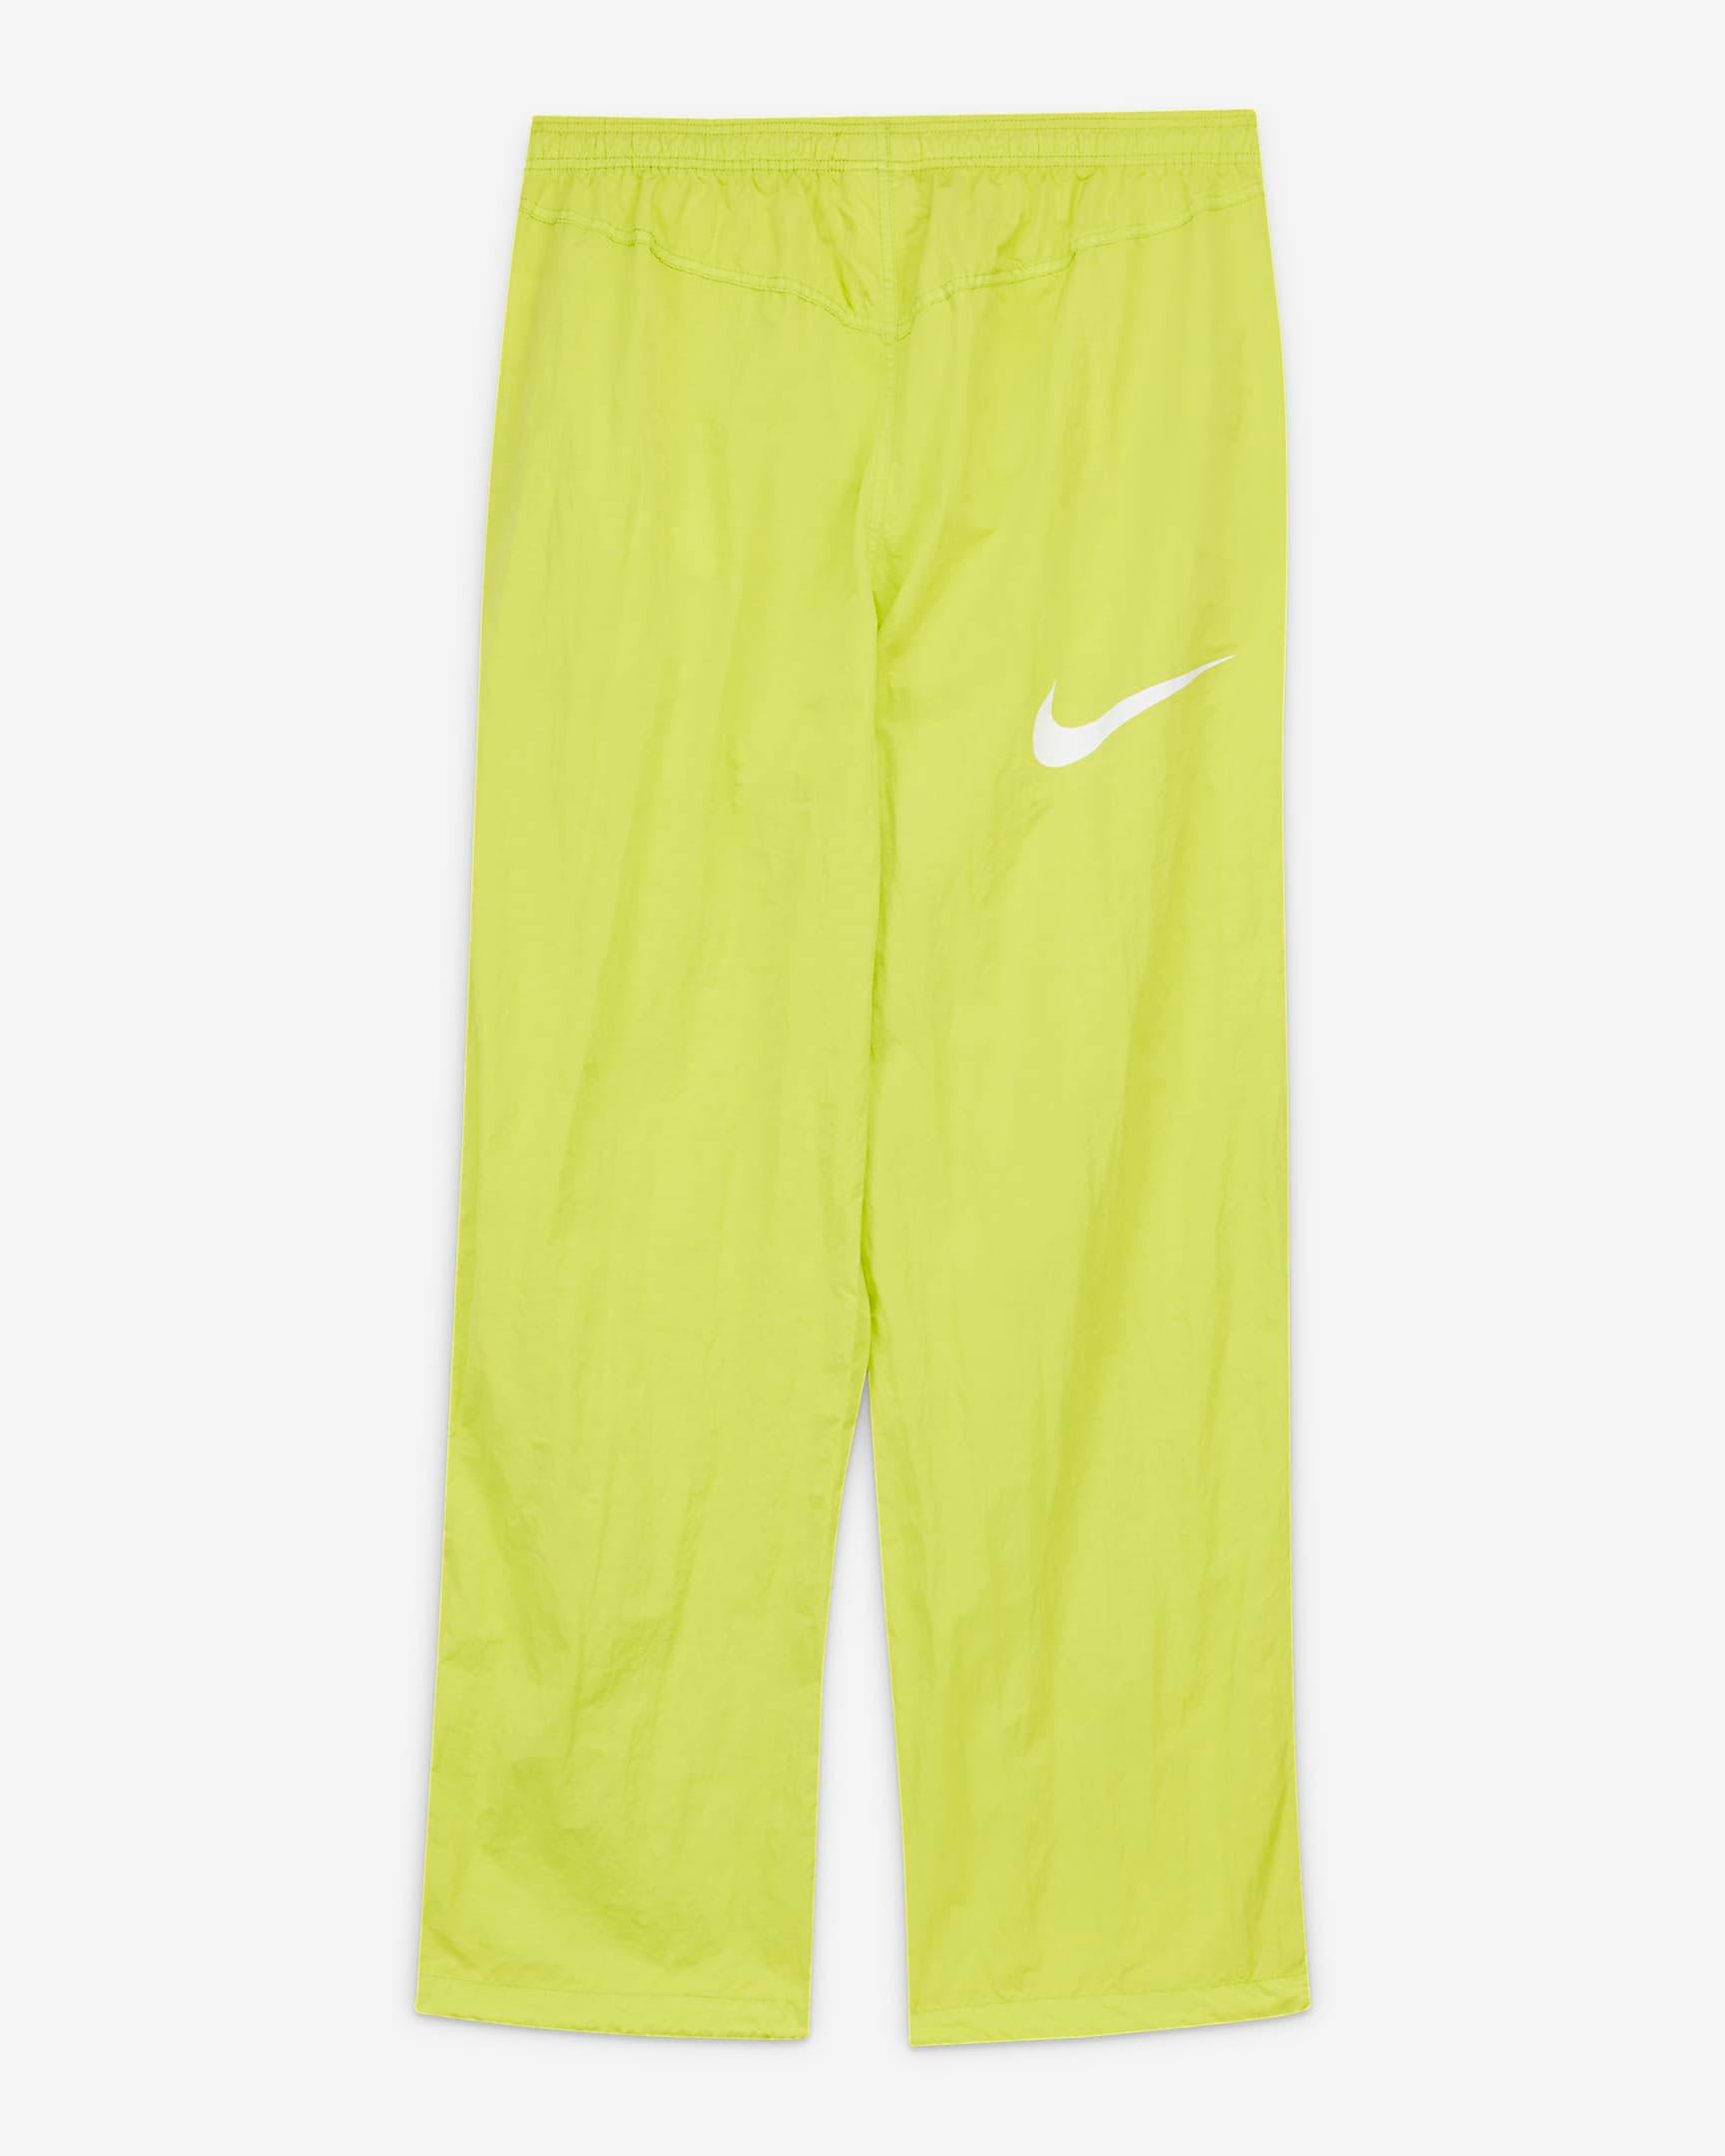 nike-stussy-beach-pants-bright-cactus-1